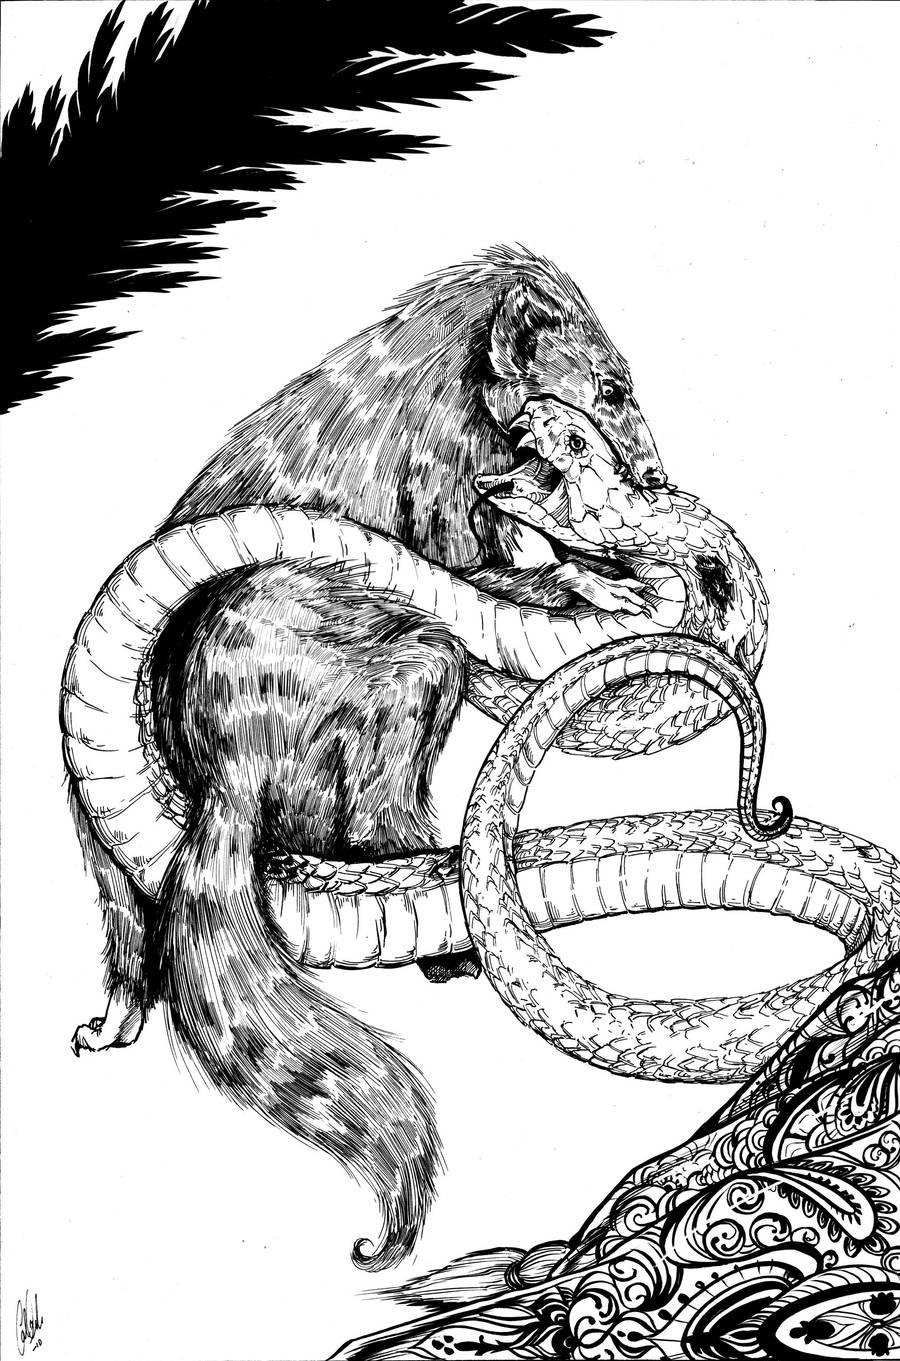 Jungle Book: Rikki-Tikki-Tavi by Carliihde